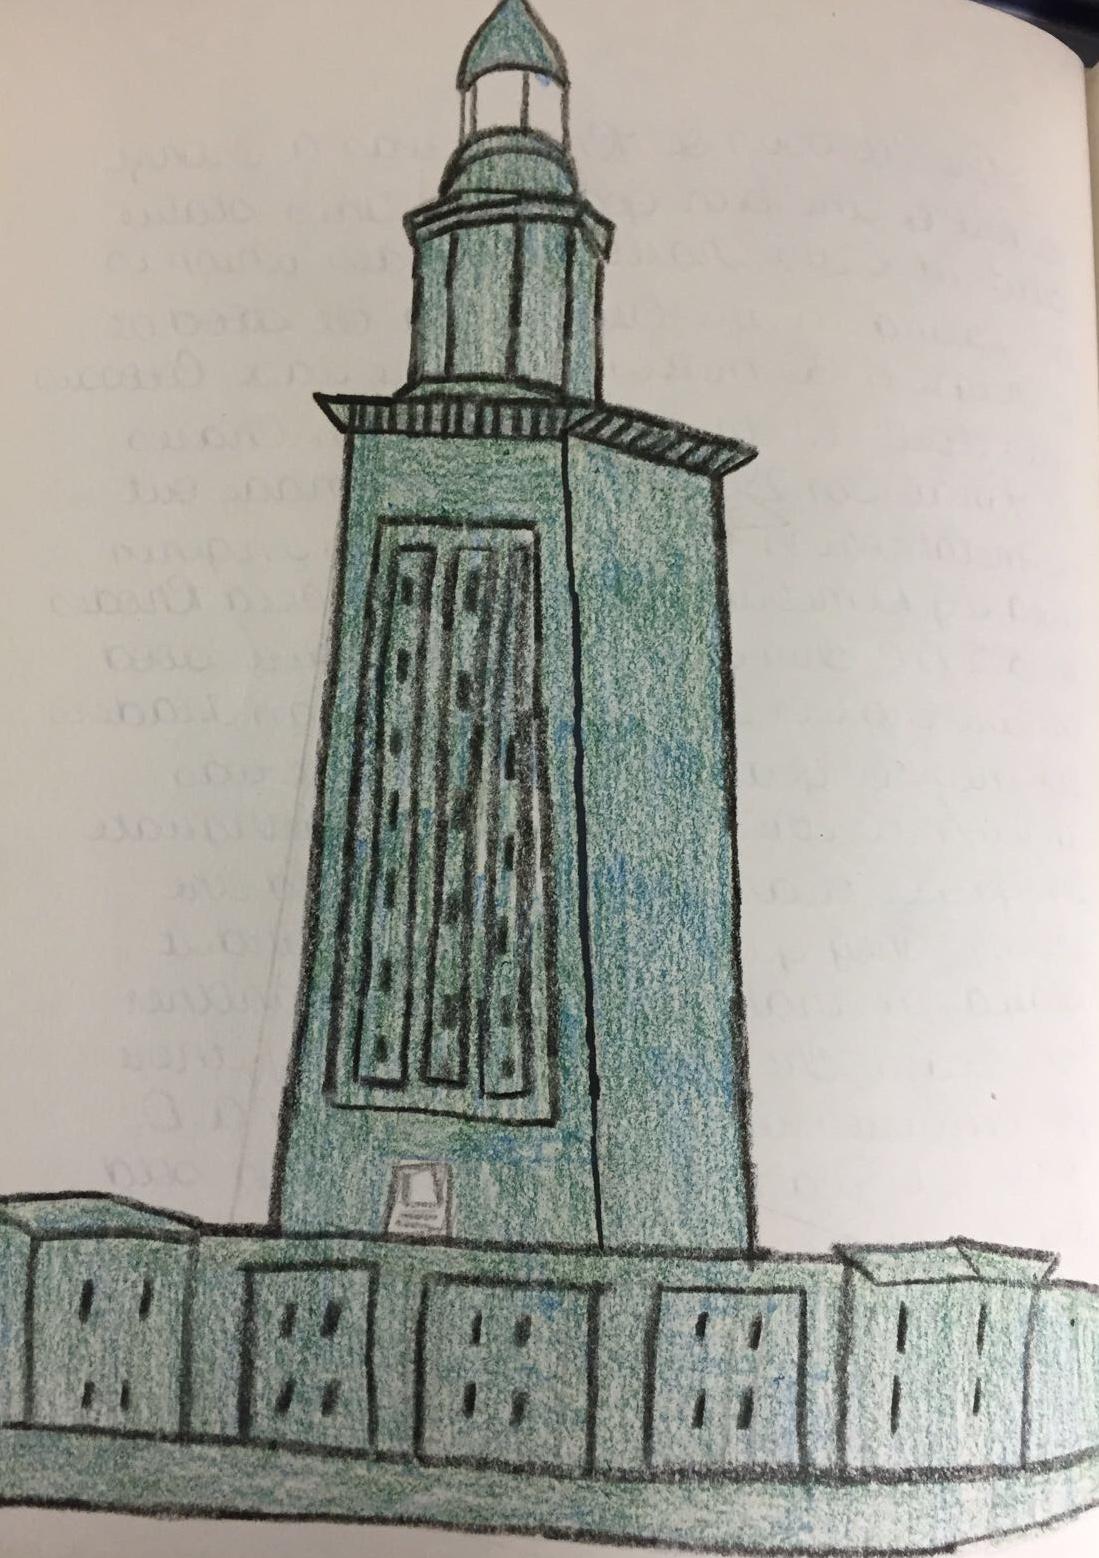 Artwork from highschool